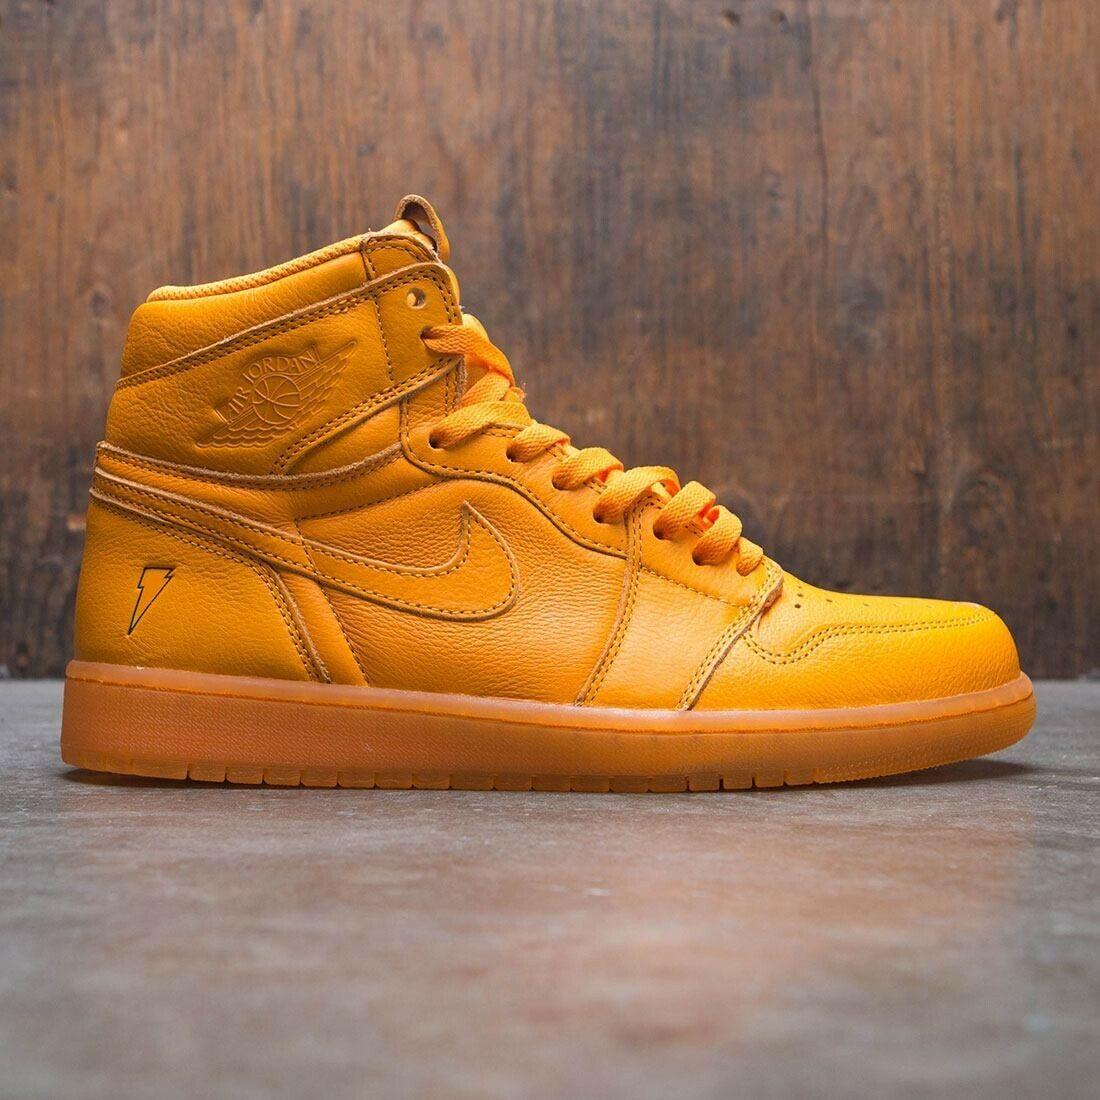 2017 Nike Air Jordan 1 Retro High OG Gatorade orange Peel Size 9. AJ5997-880